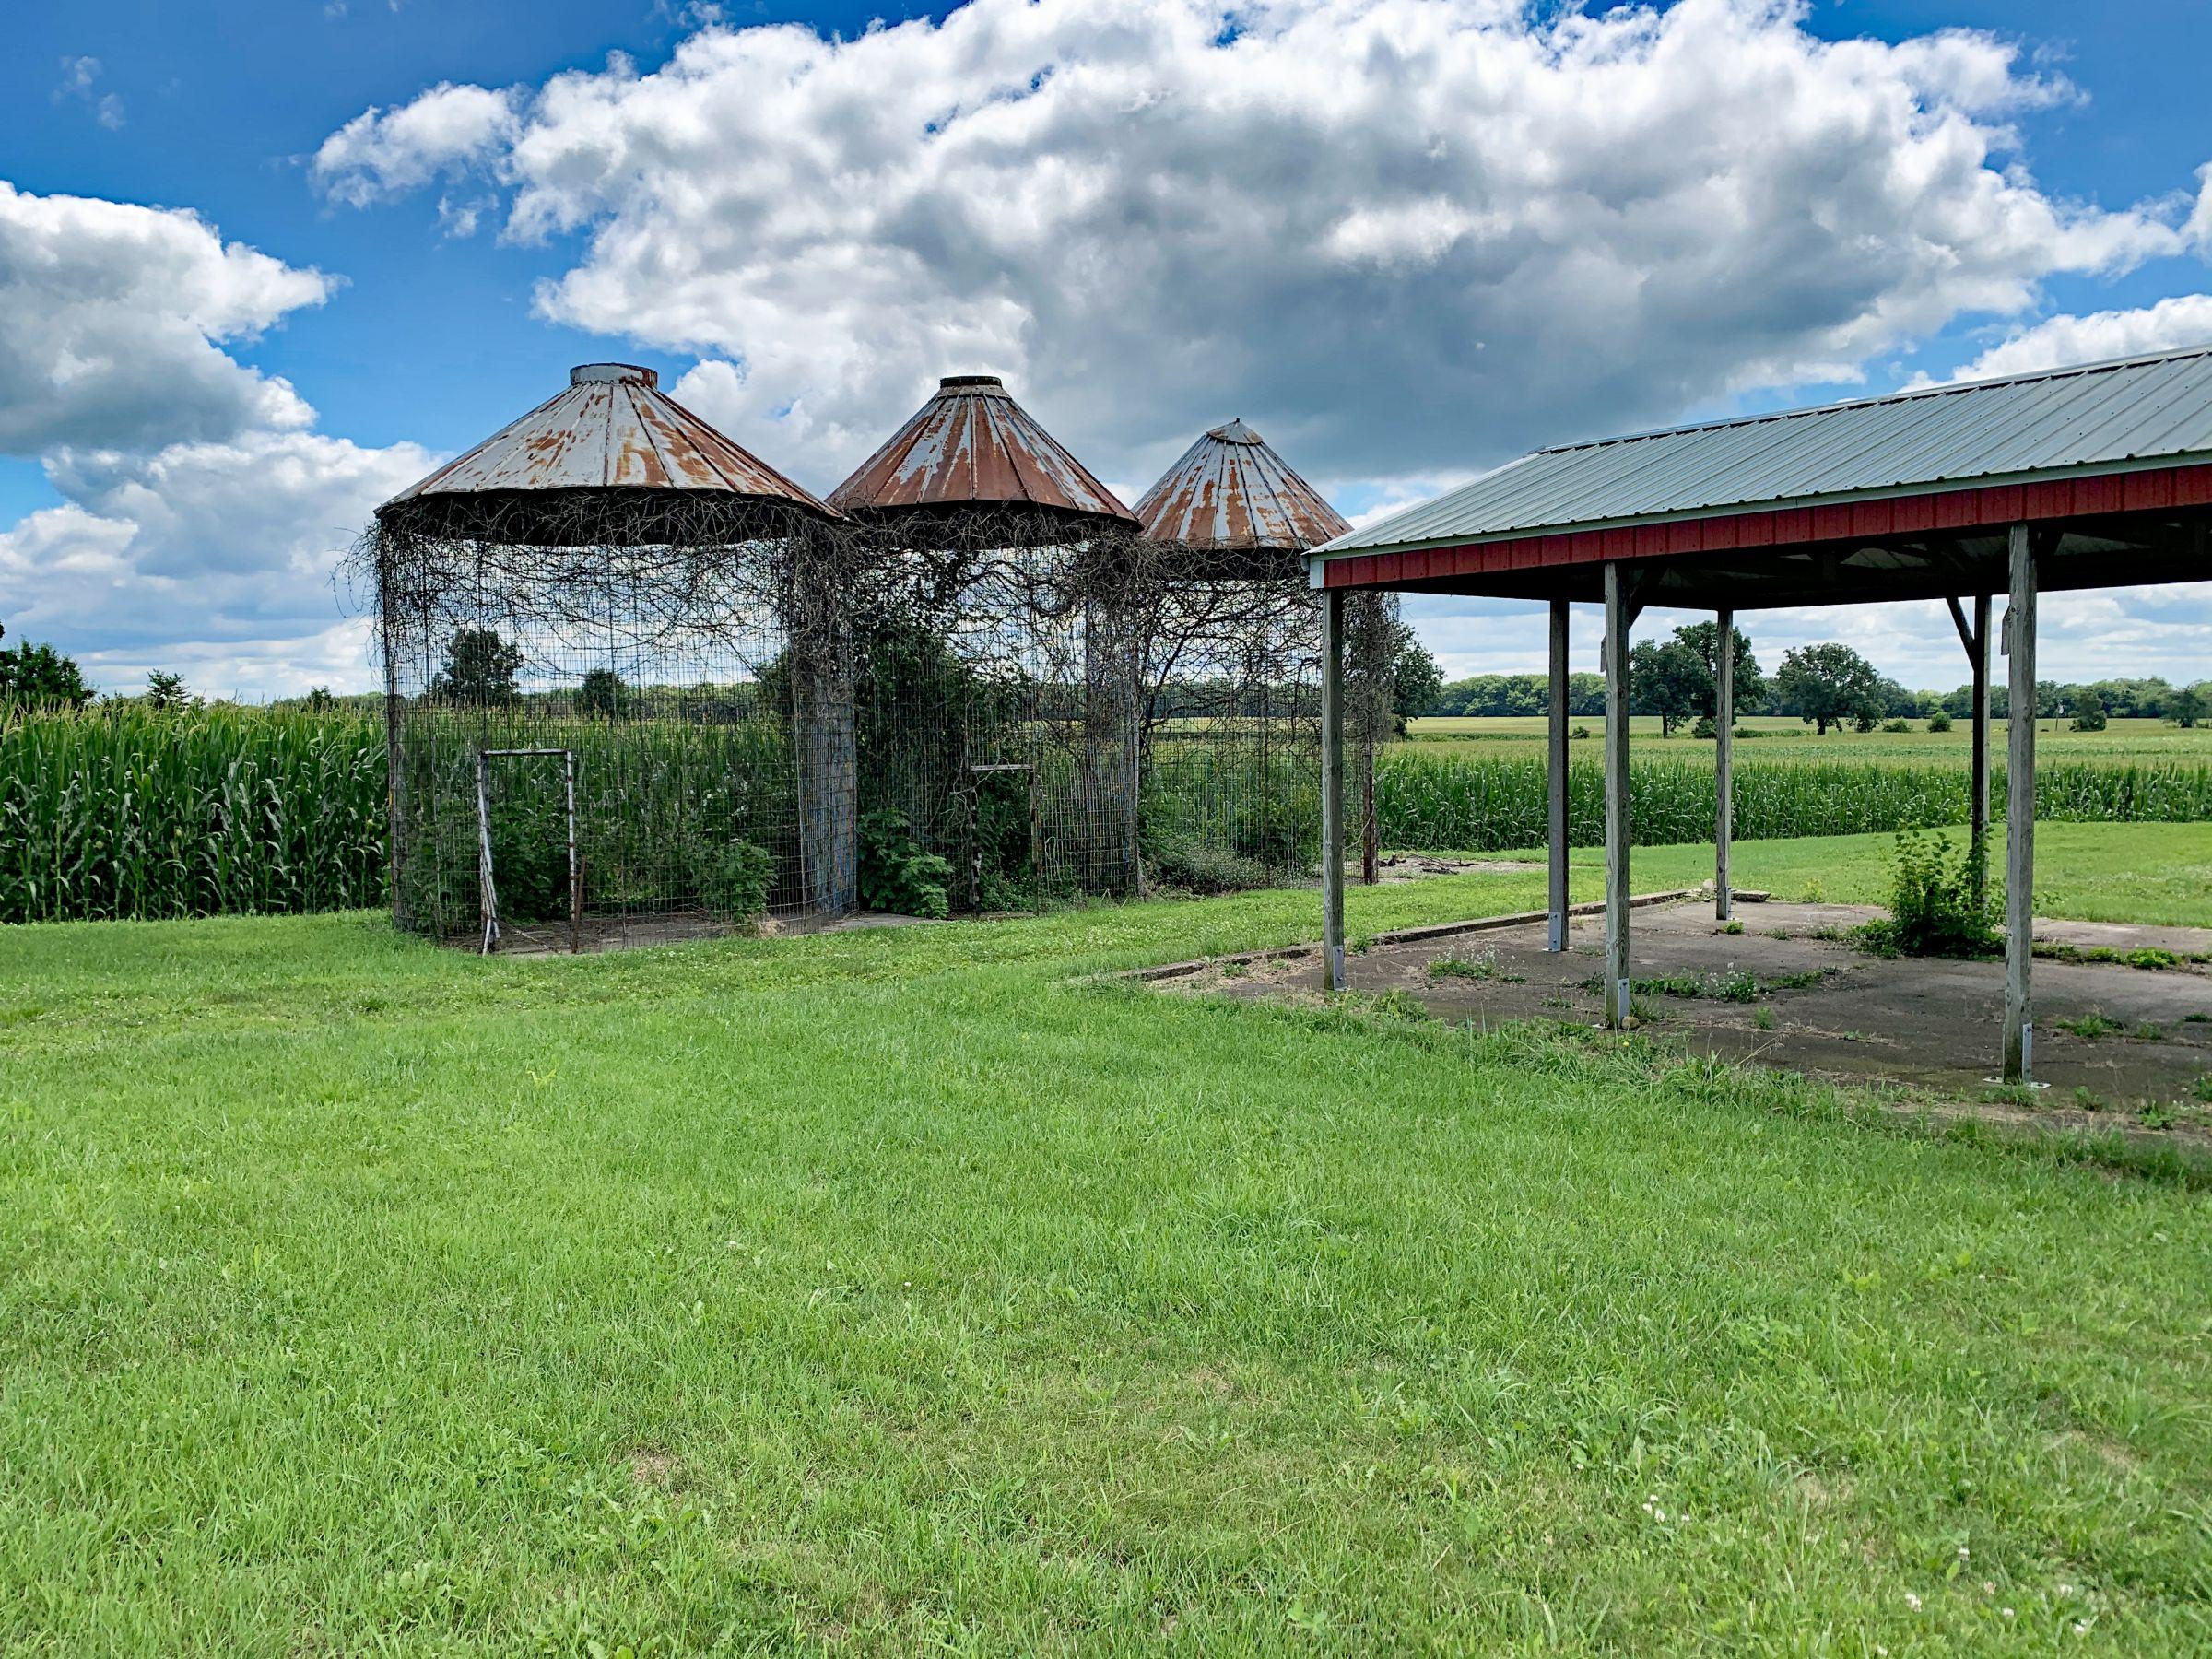 land-winnebago-county-illinois-127-acres-listing-number-15094-6-2020-08-03-160429.jpg